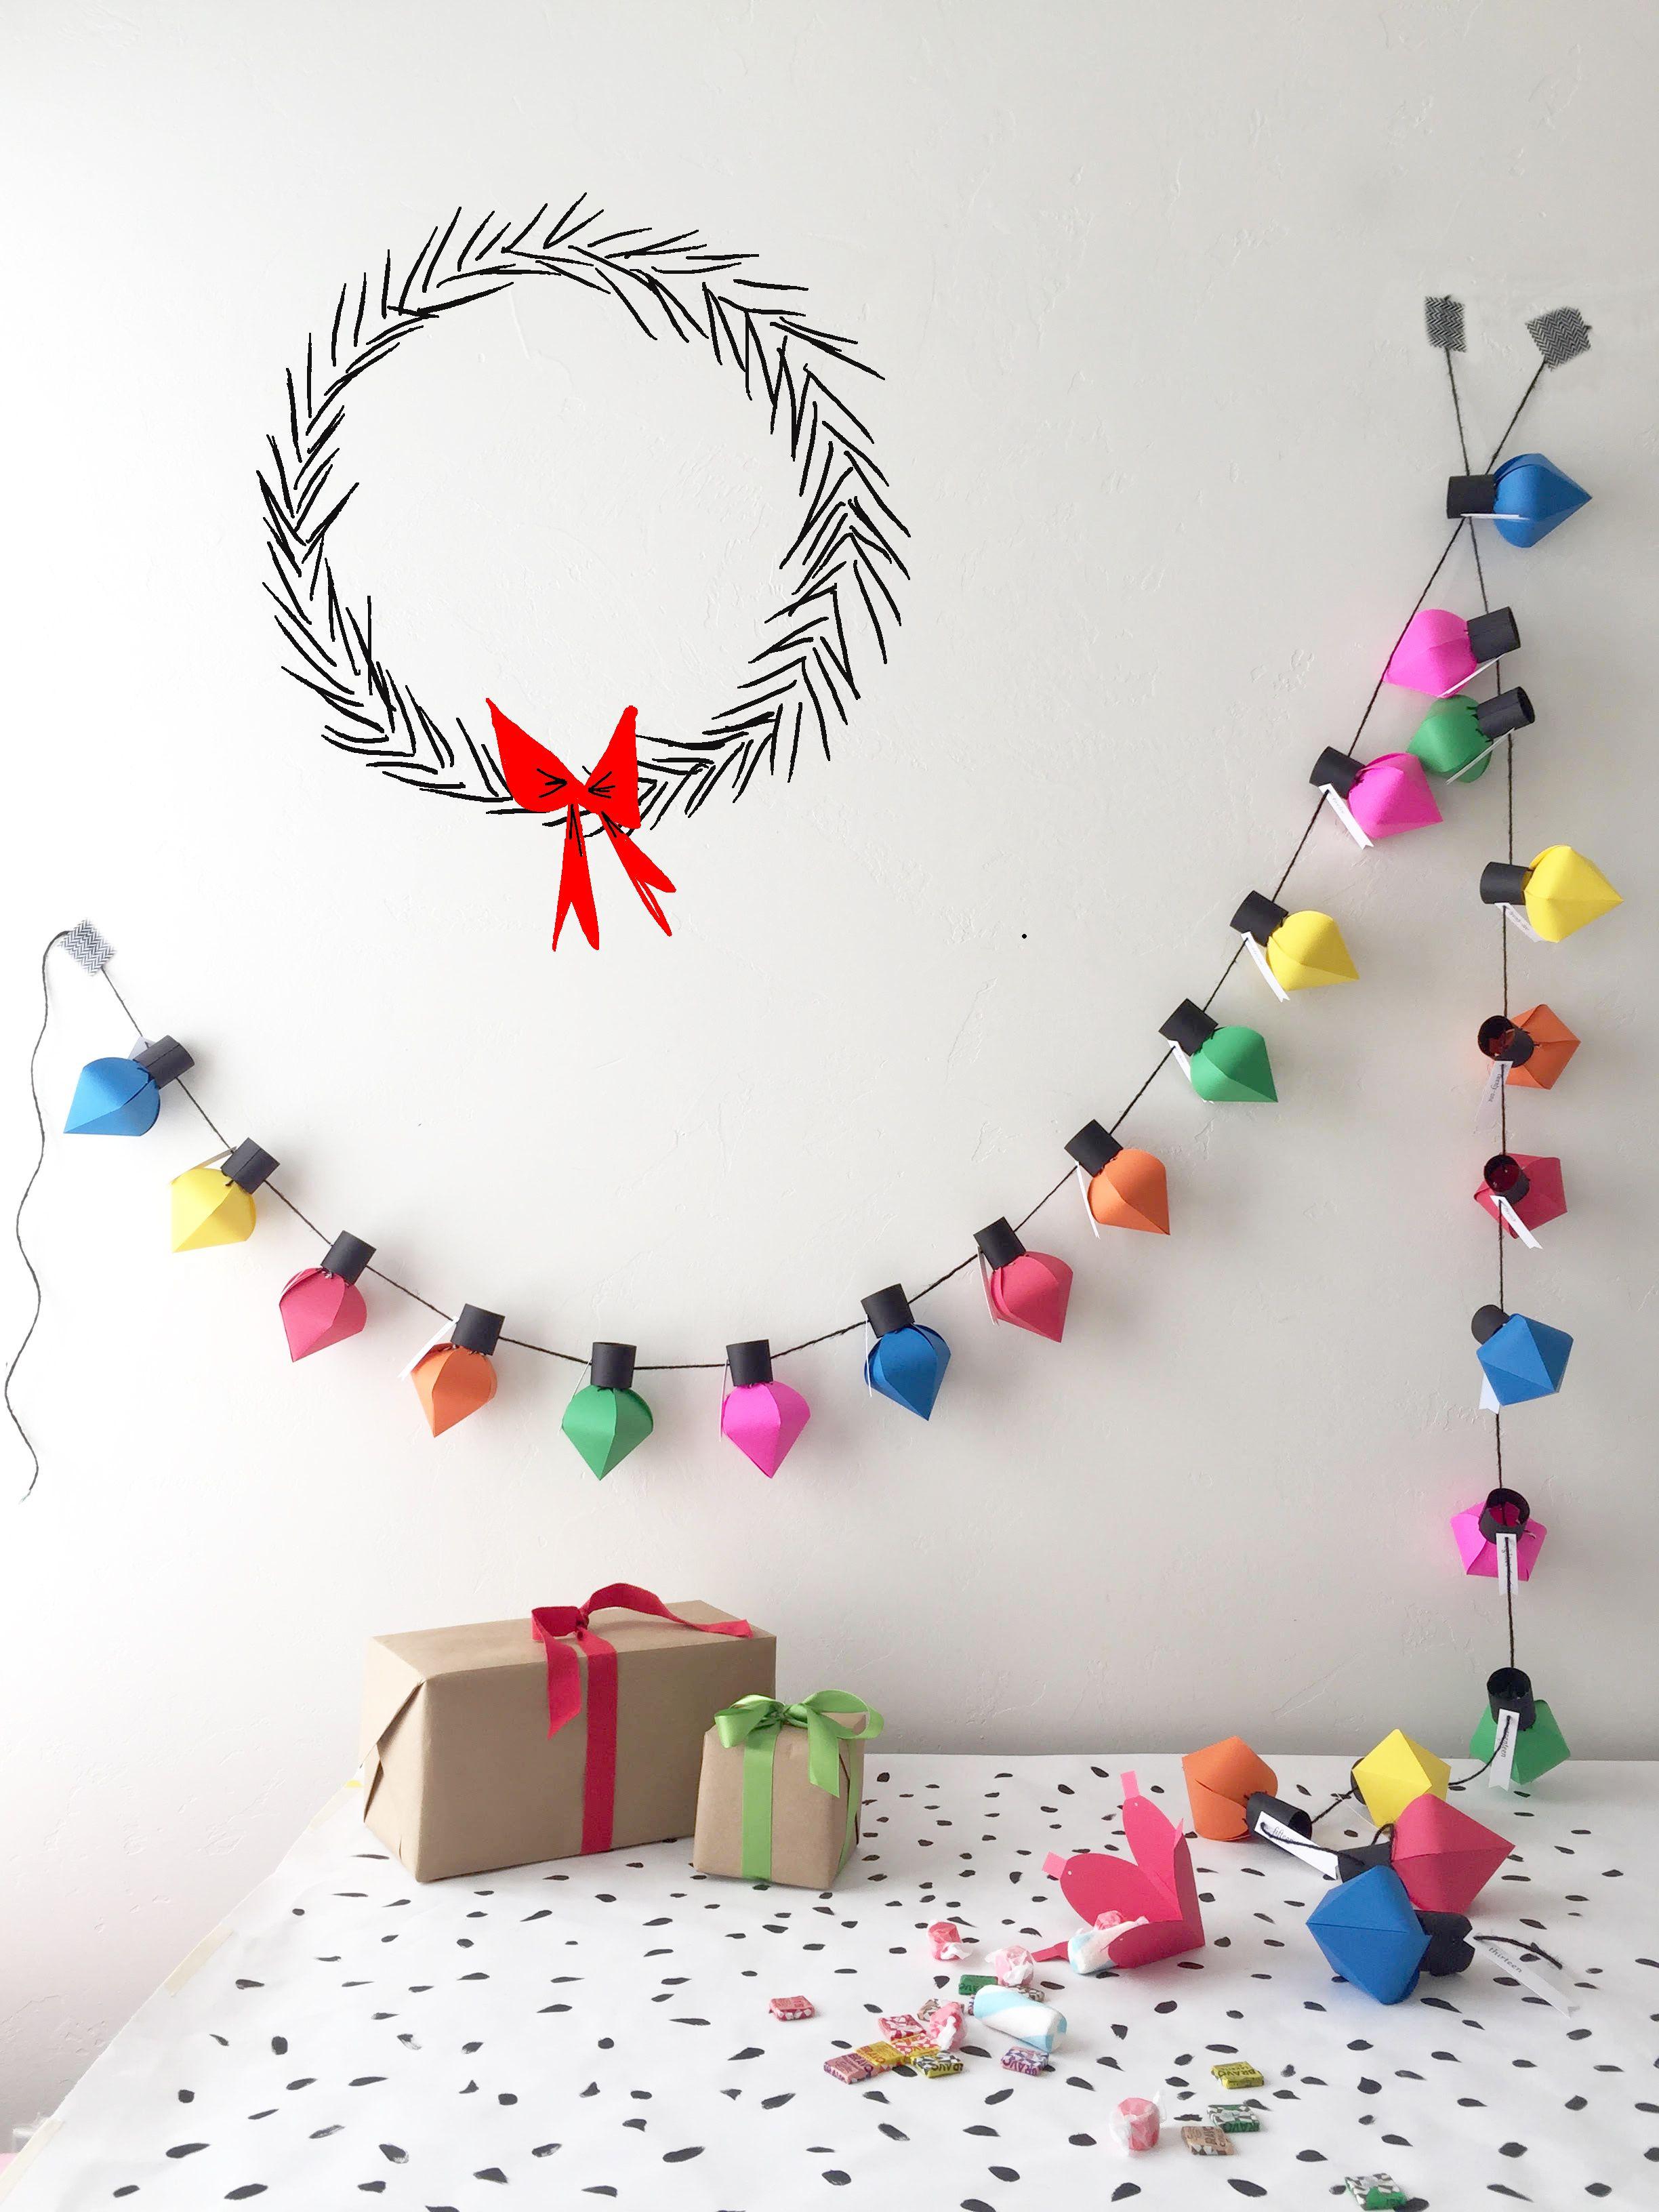 100 Christmas Home Decorating Ideas - Beautiful Christmas Decorations